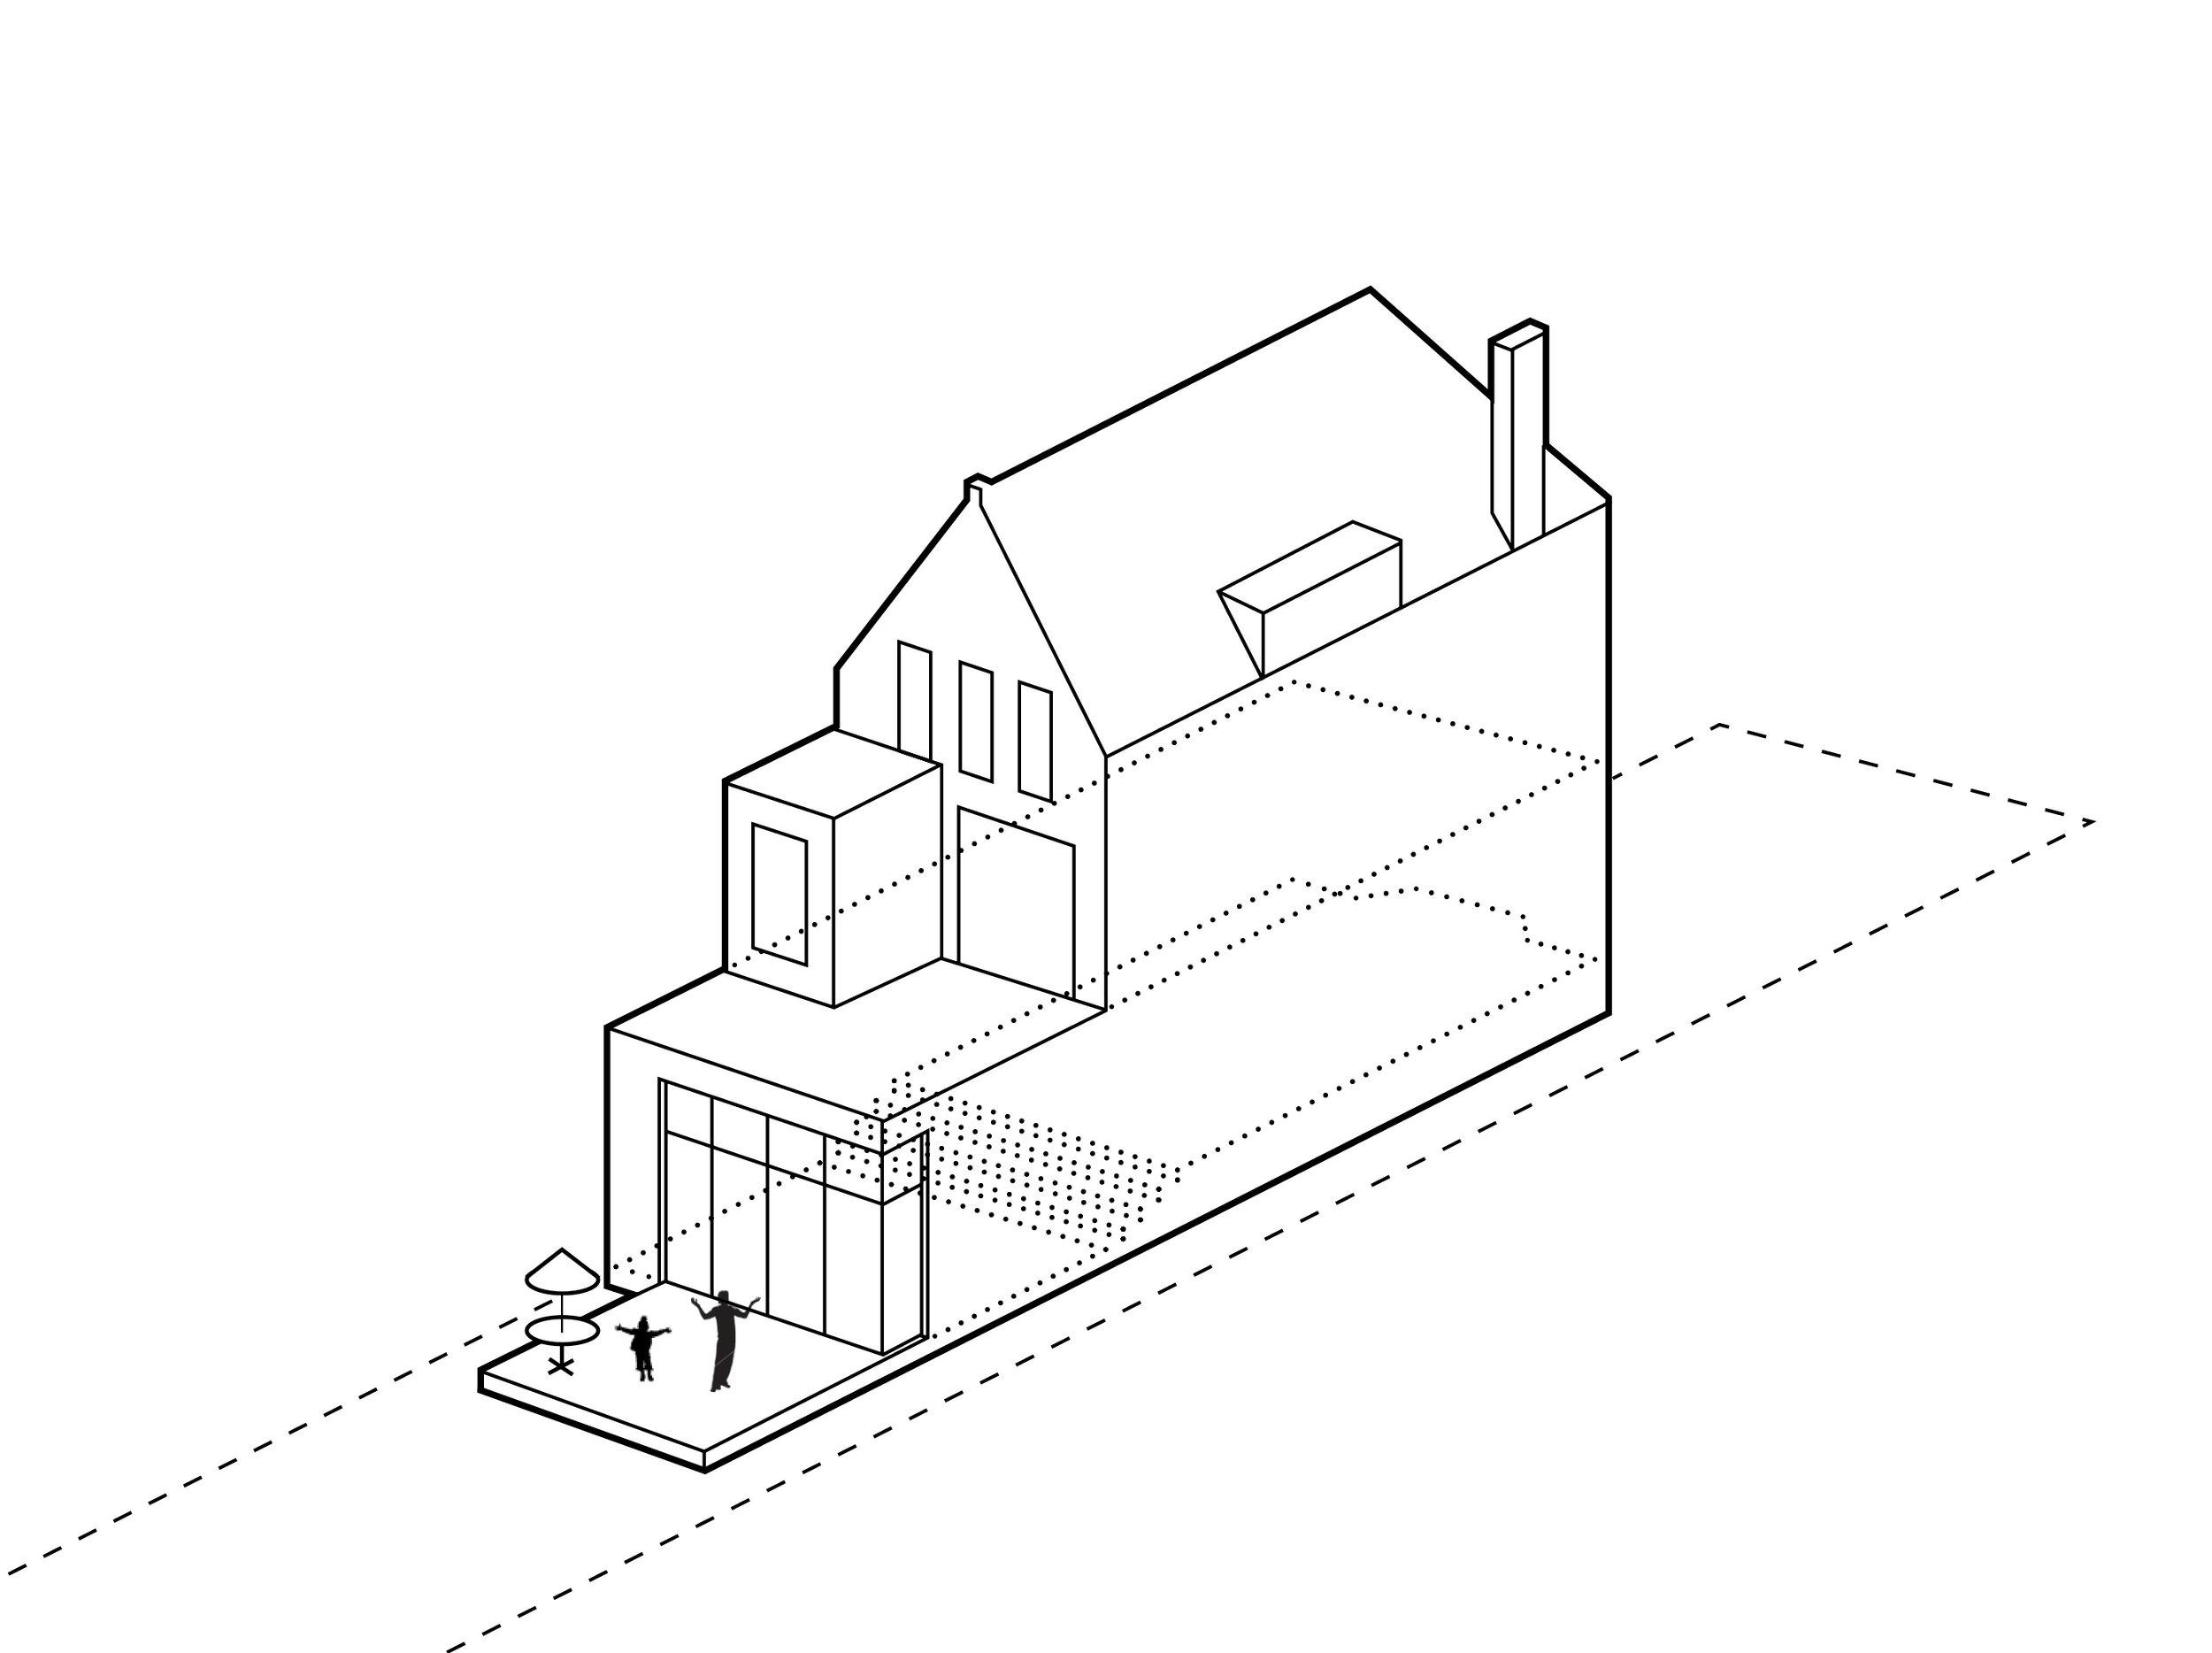 Personal-Architecture-rotterdam-woonhuis7-3.jpg